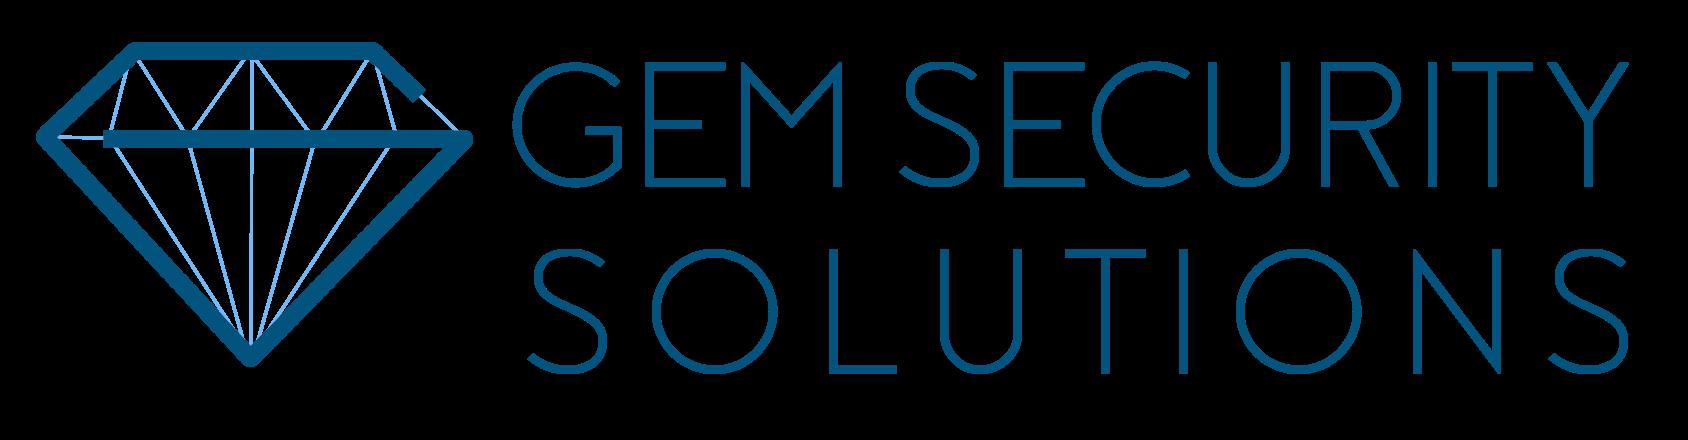 GEM SECURITY SOLUTIONS Logo